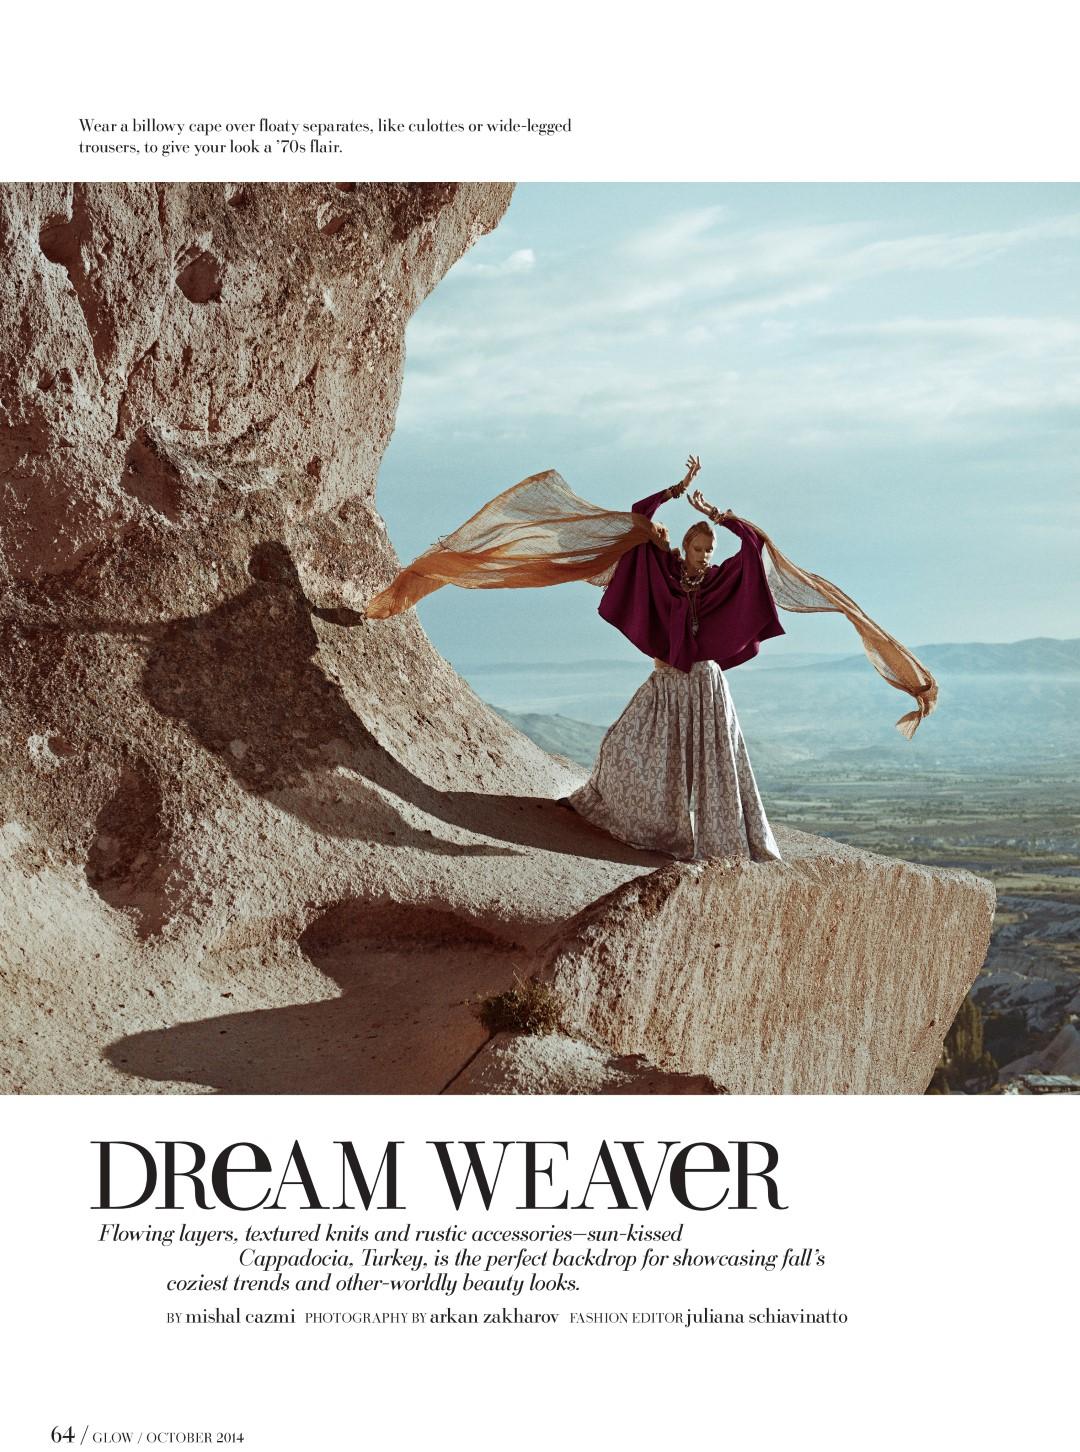 glow-magazine-dream-weaver-cappadocia